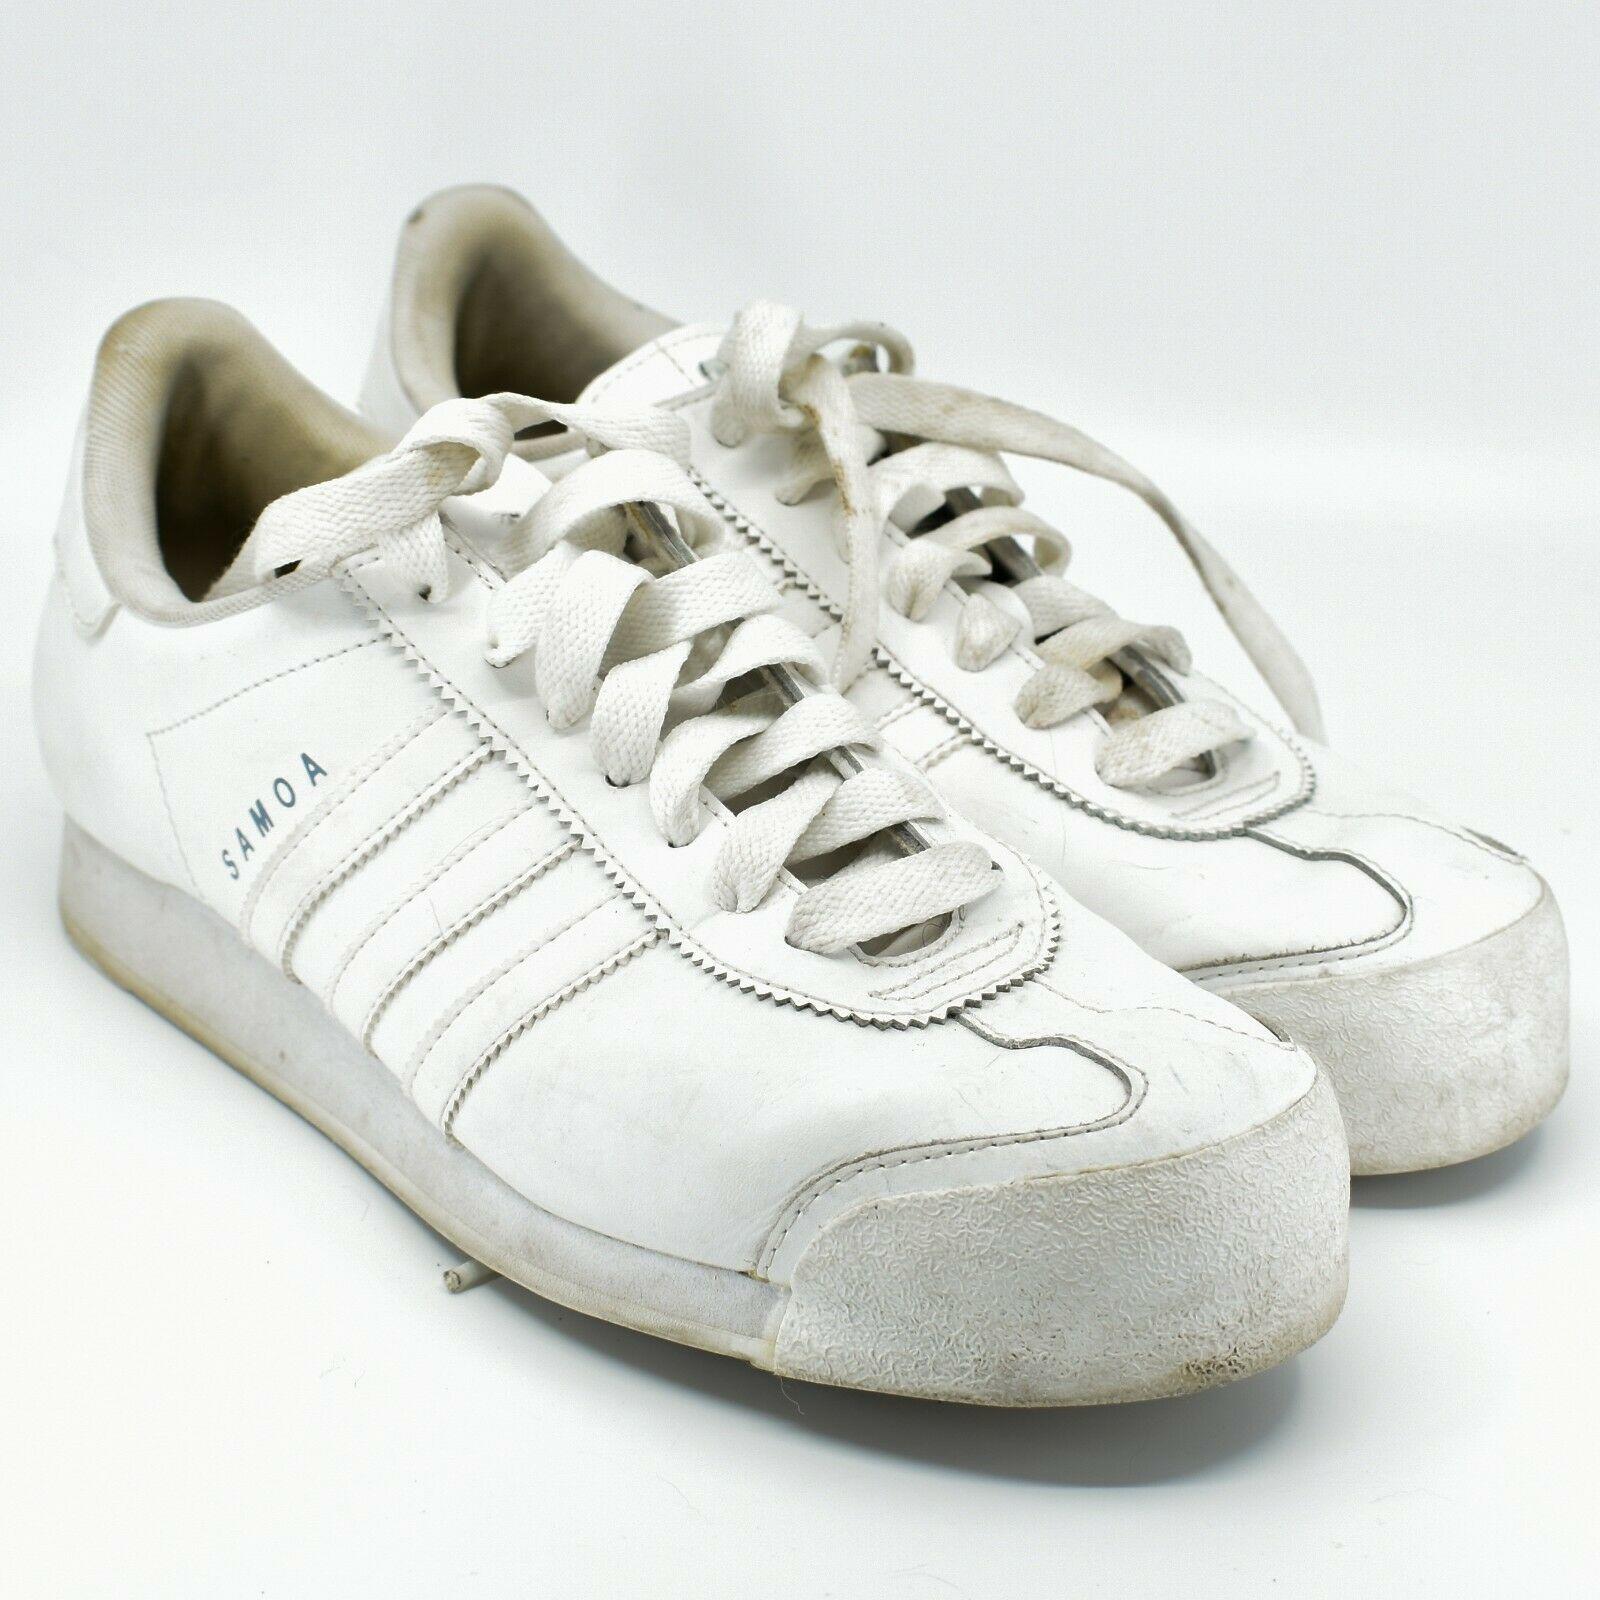 Adidas Samoa Women's White Lace Up Athletic Sneaker Shoes Size 10 G20682